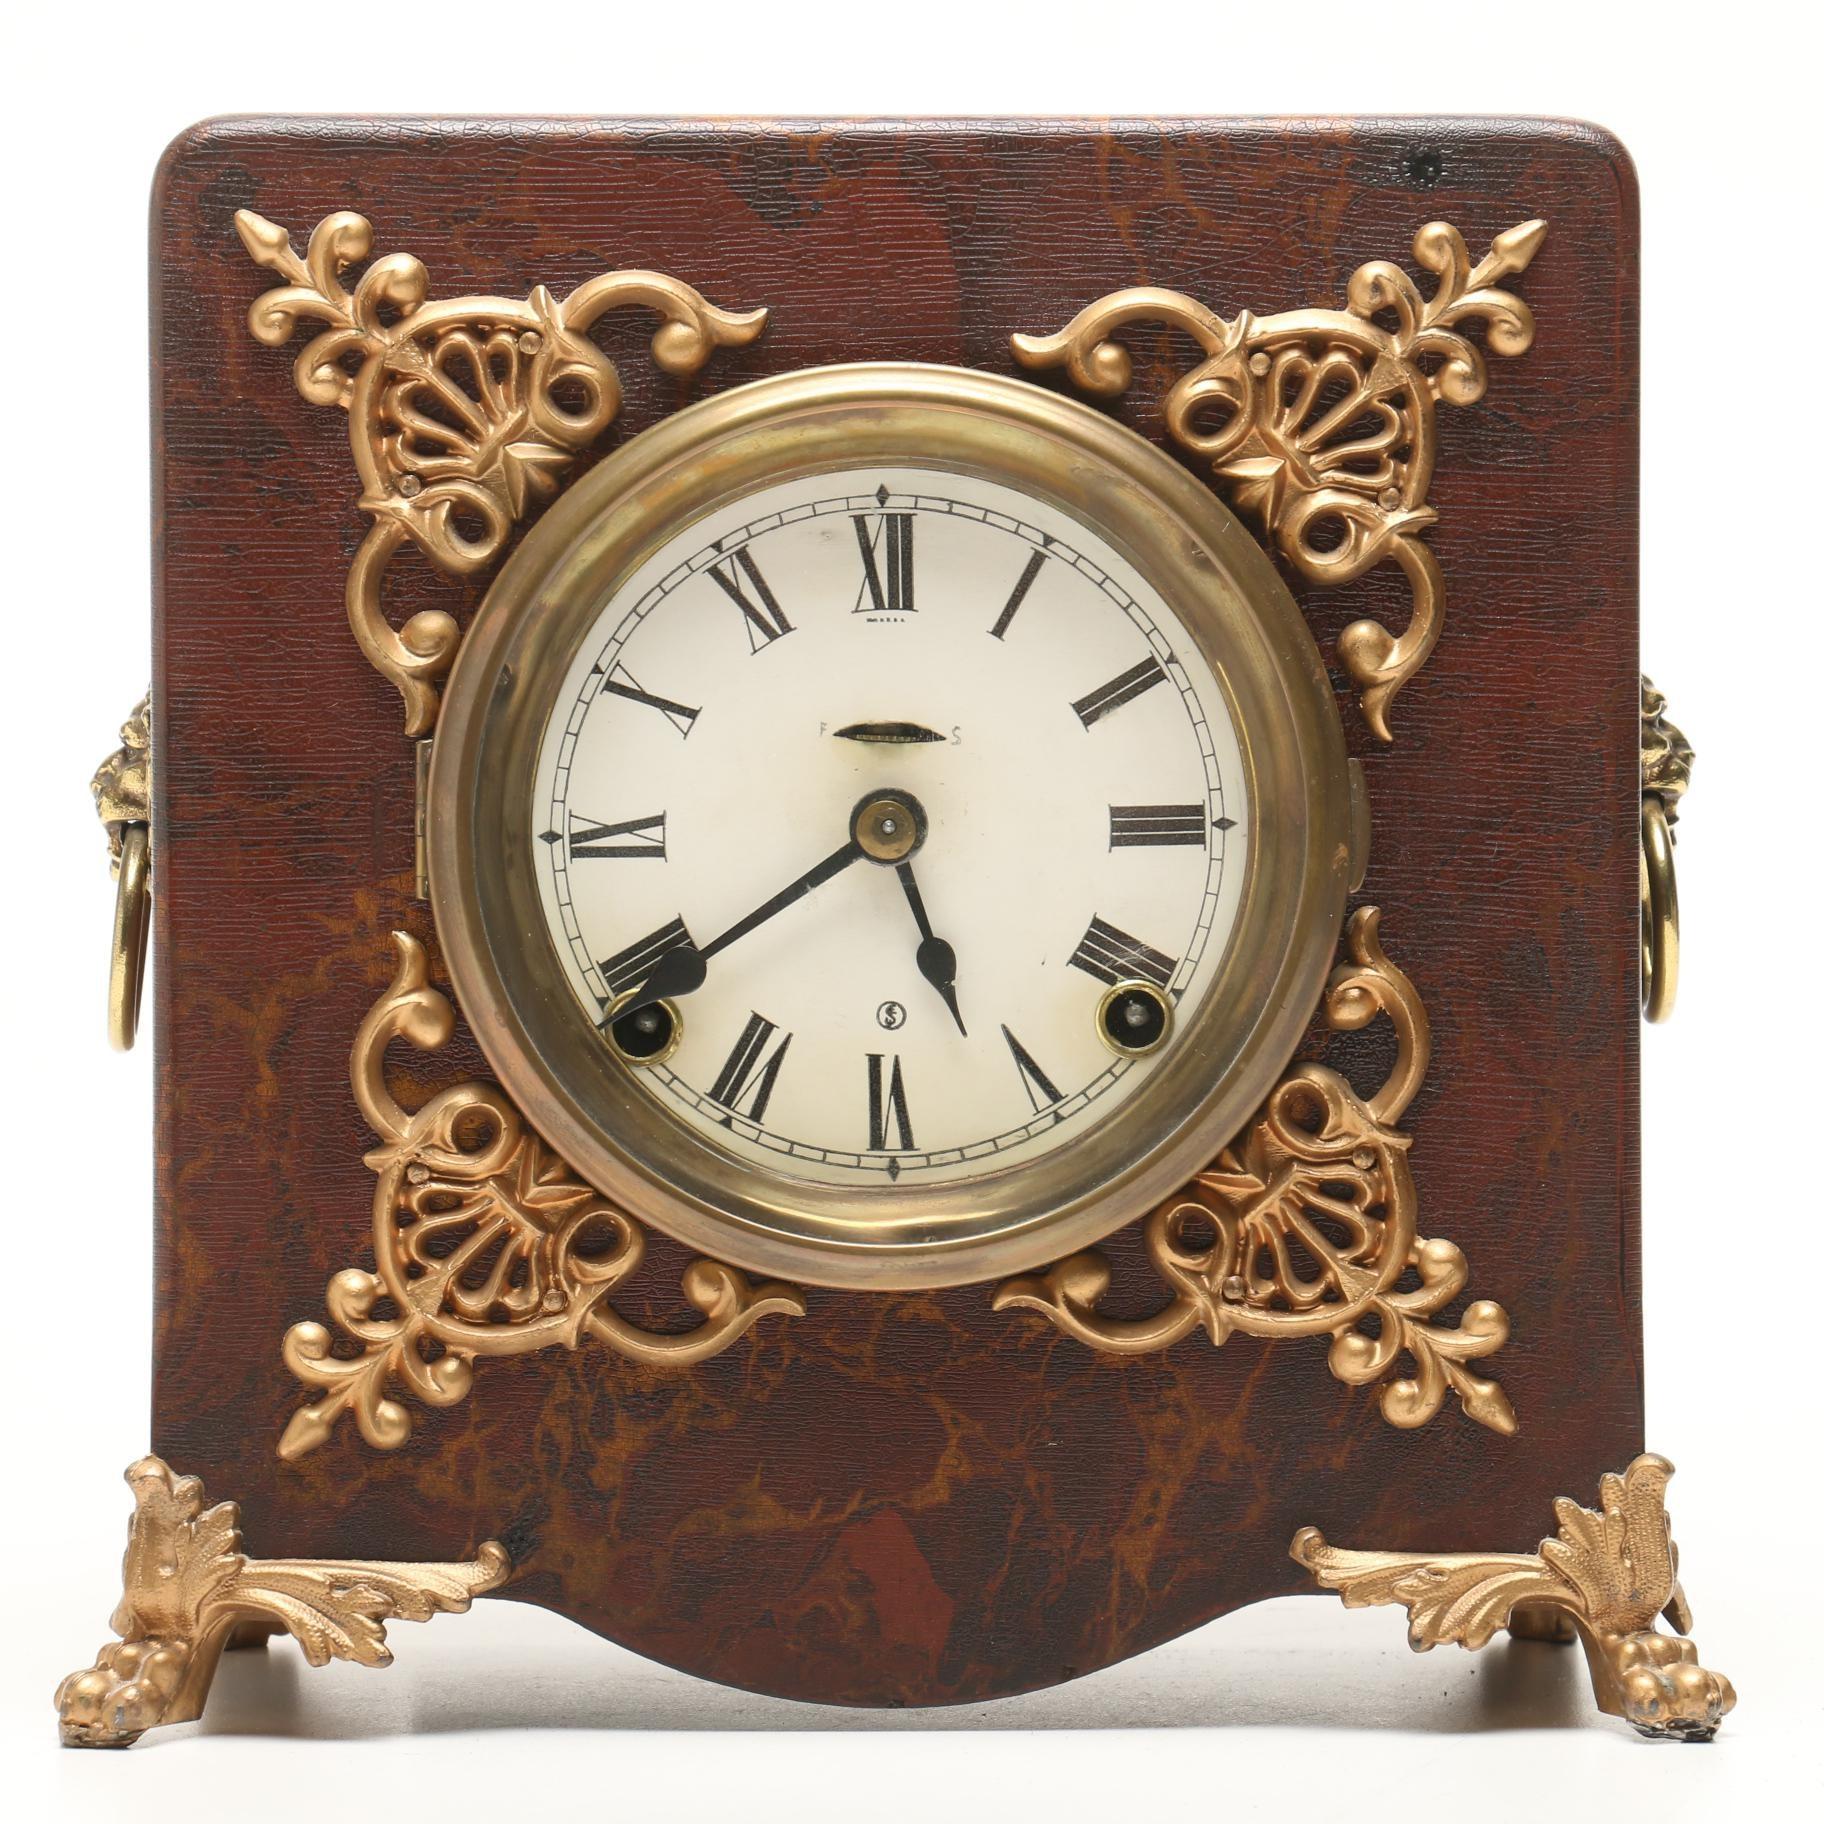 Ingraham Brass Mounted Mantel Clock with Lion Head Ring Handles